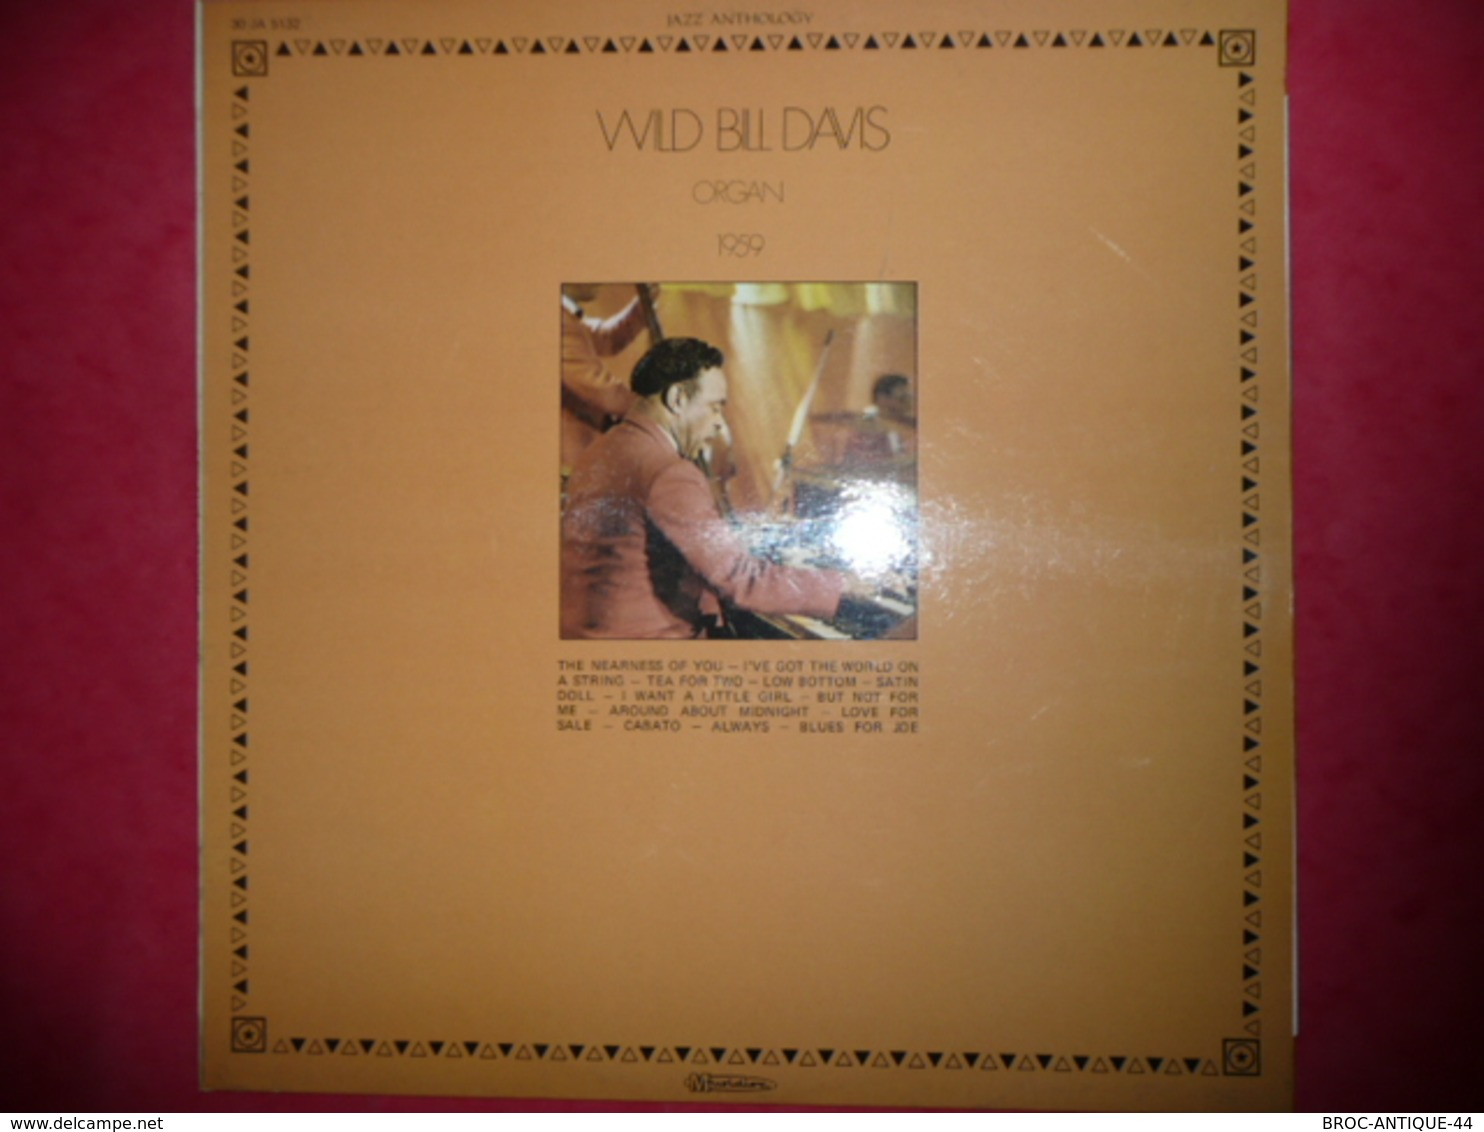 LP N°1659 - WILD BILL DAVIS - ORGAN 1959 - COMPILATION 12 TITRES - Jazz